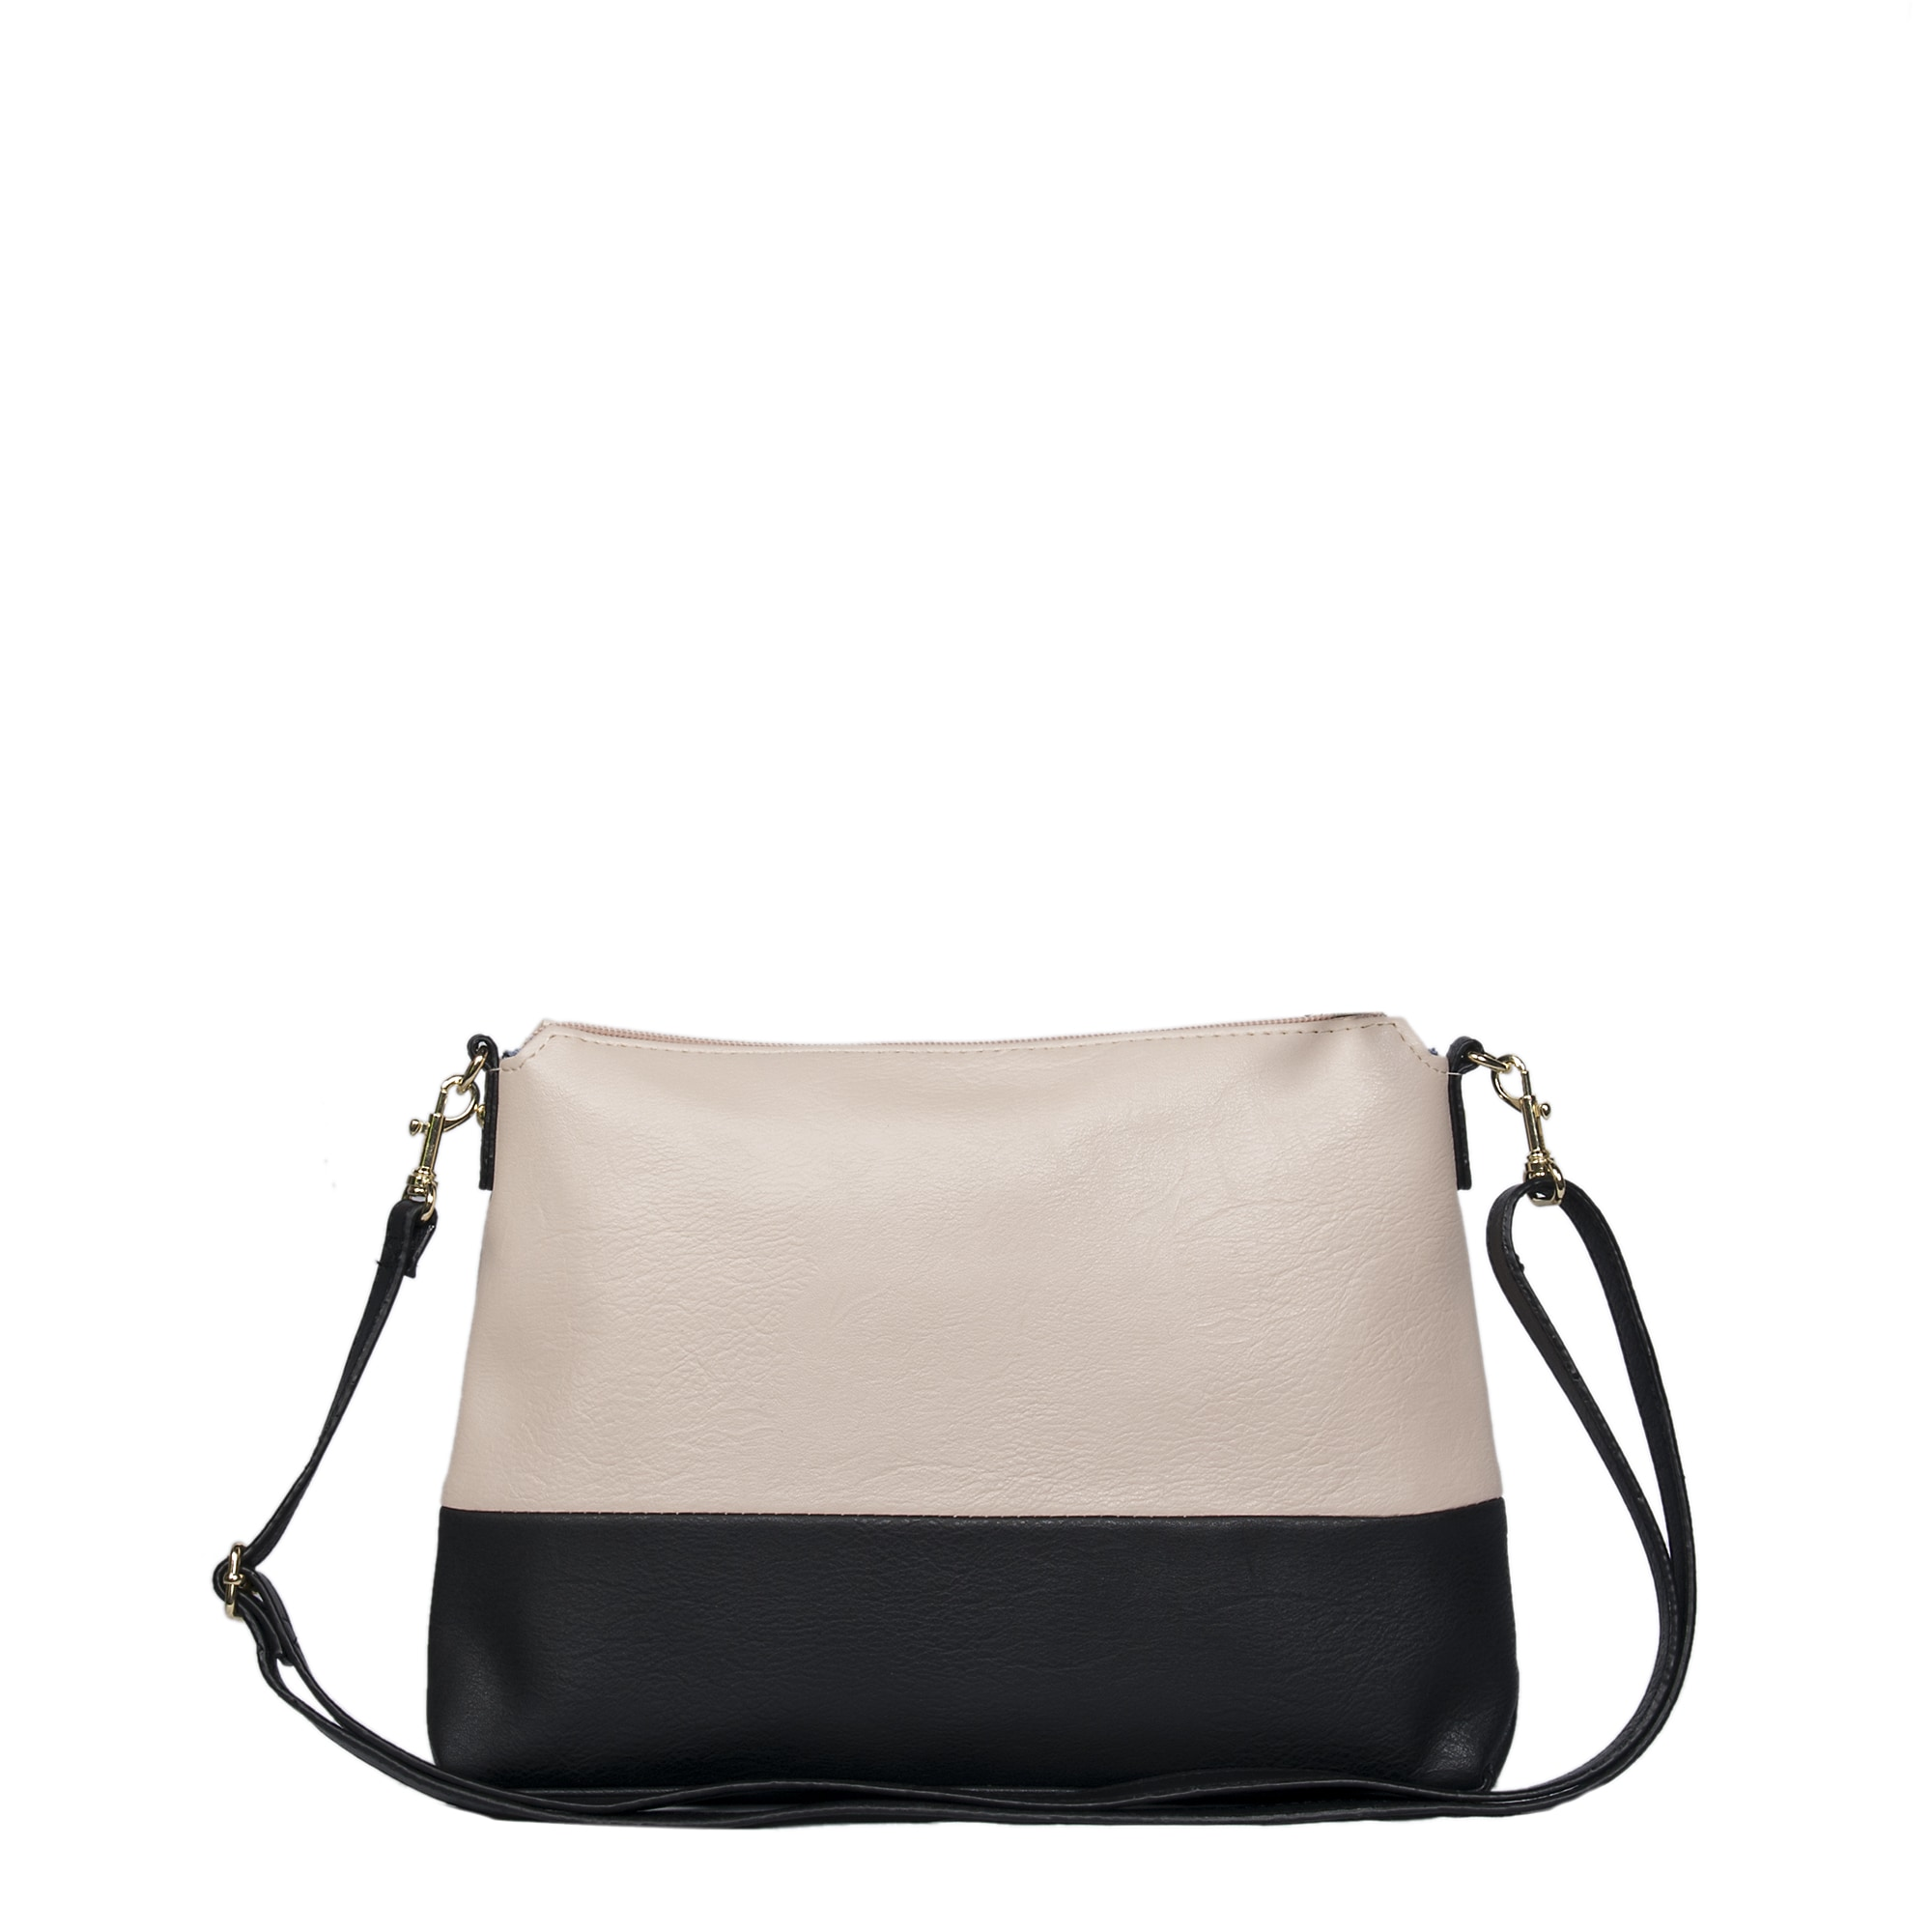 Emilie M. Lea Top Zipper Crossbody Bag